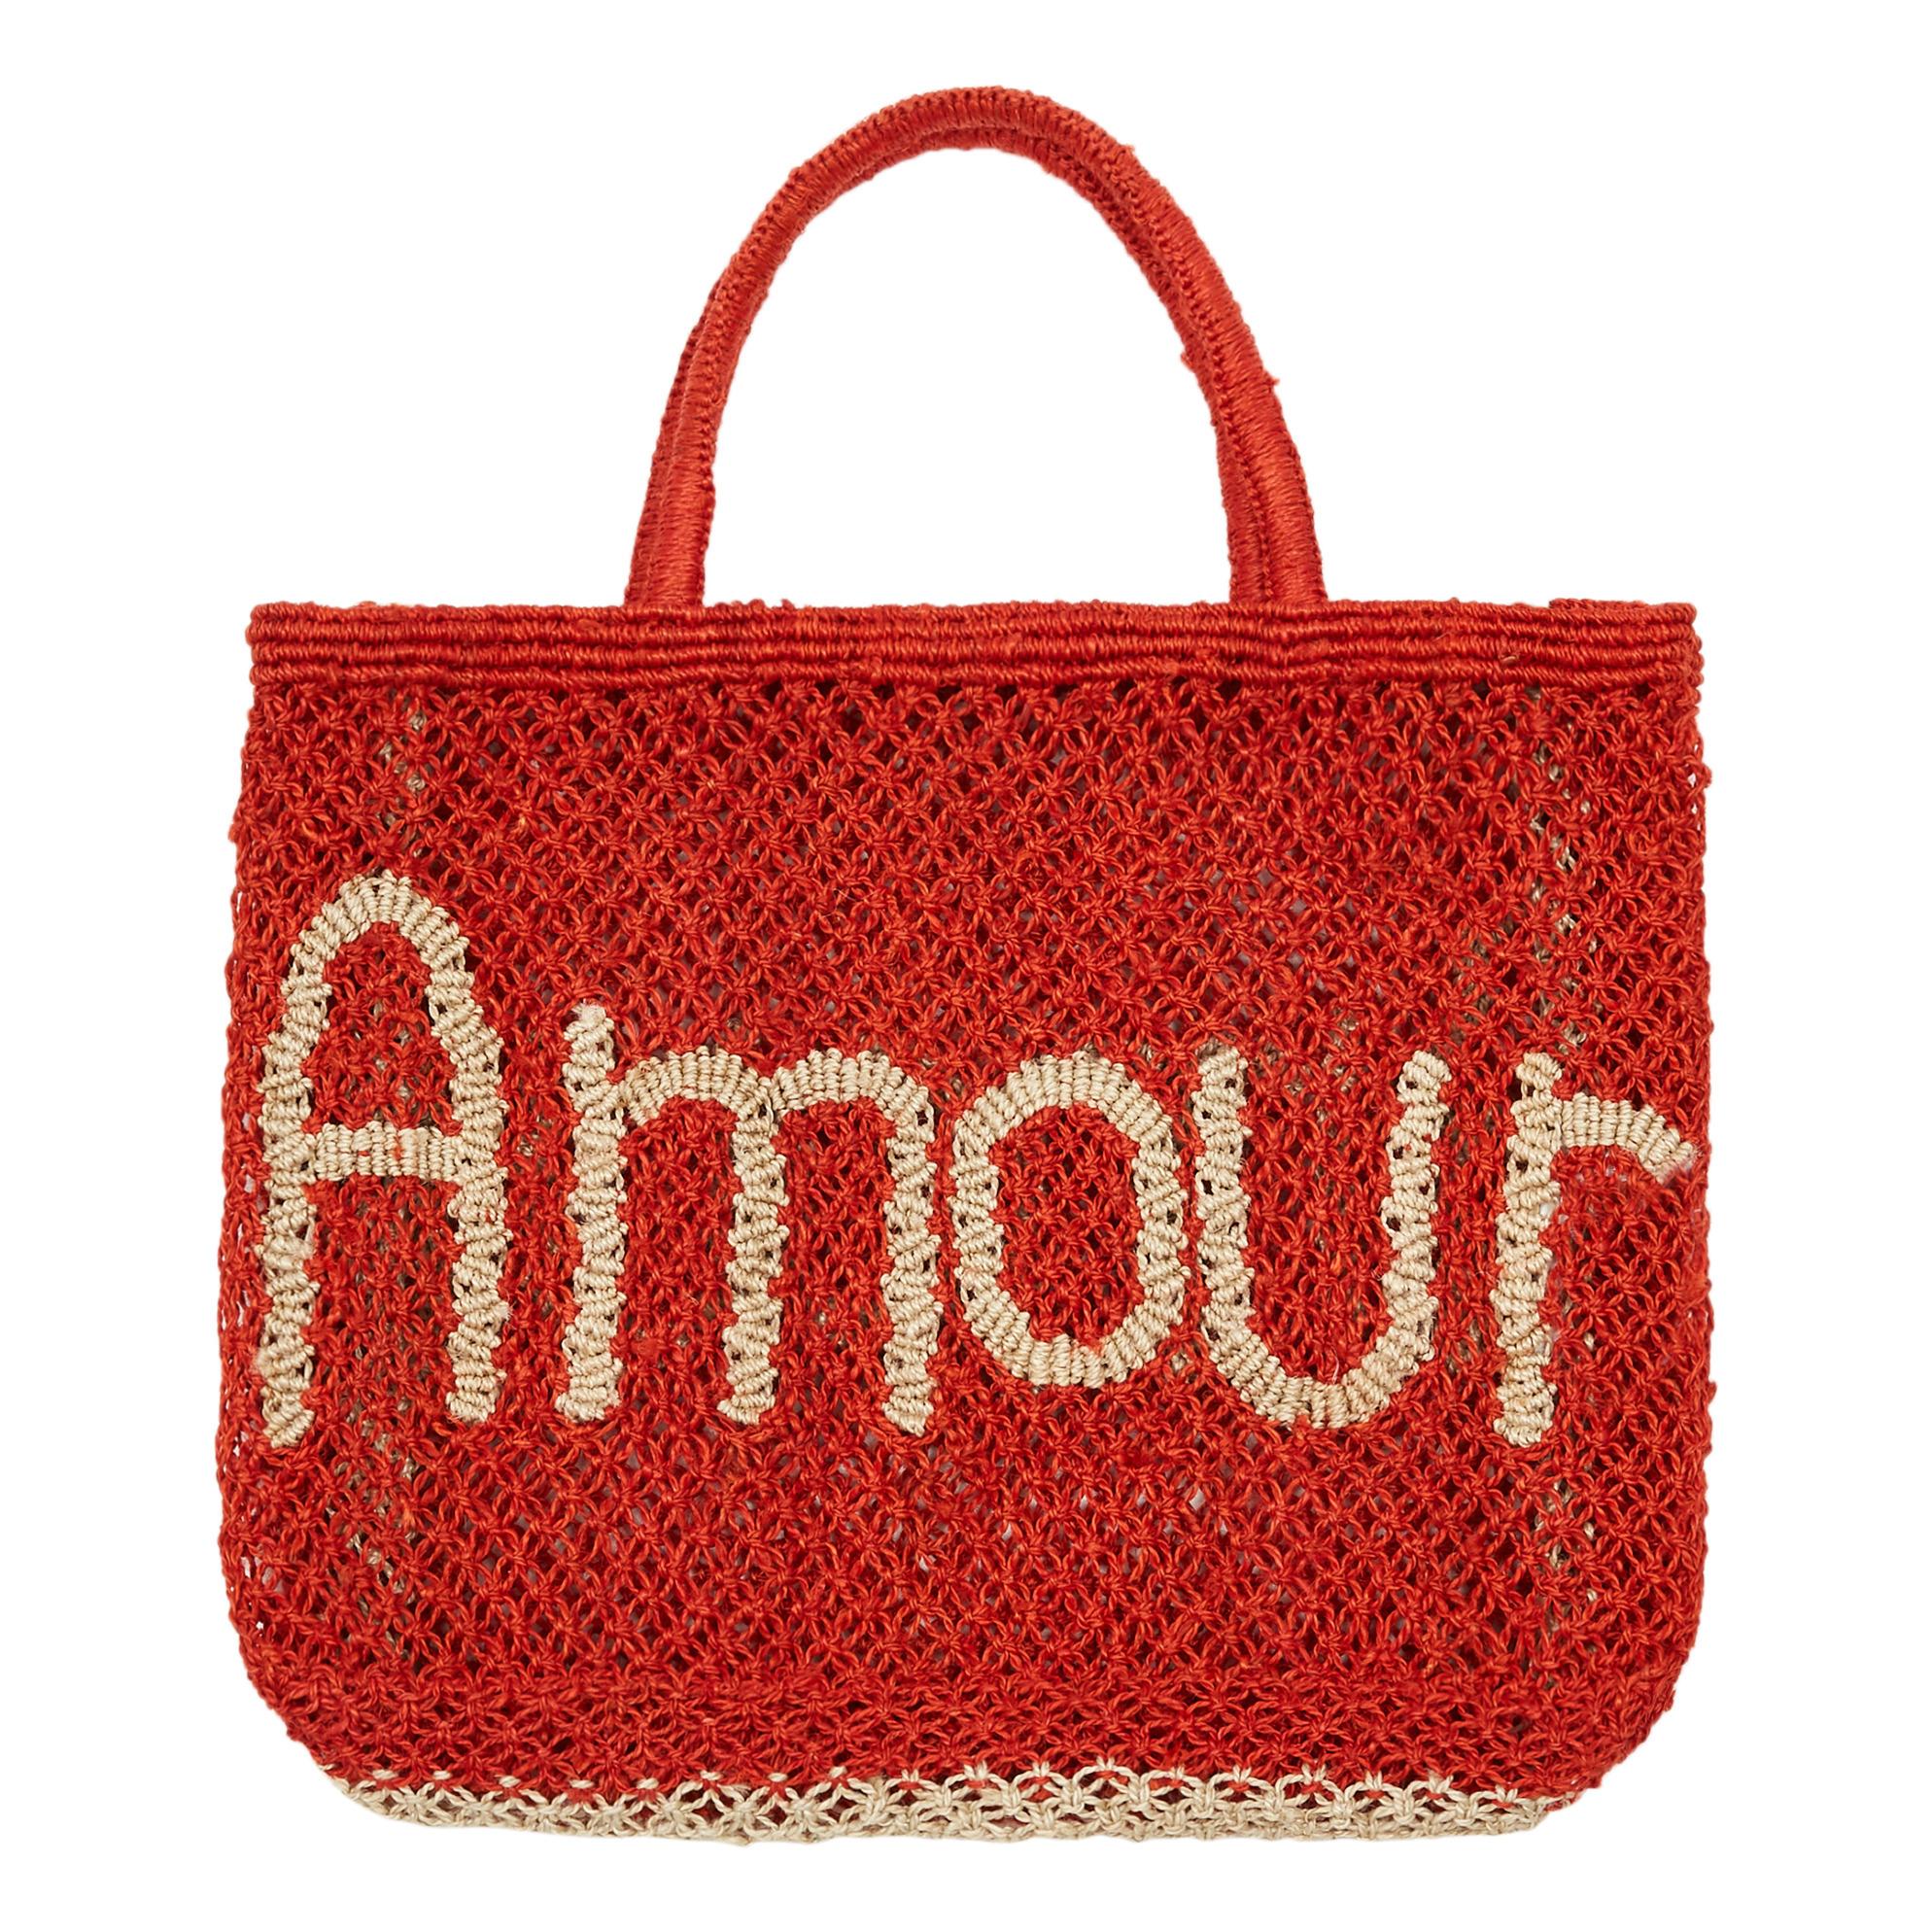 Image of Amour Basket Bag